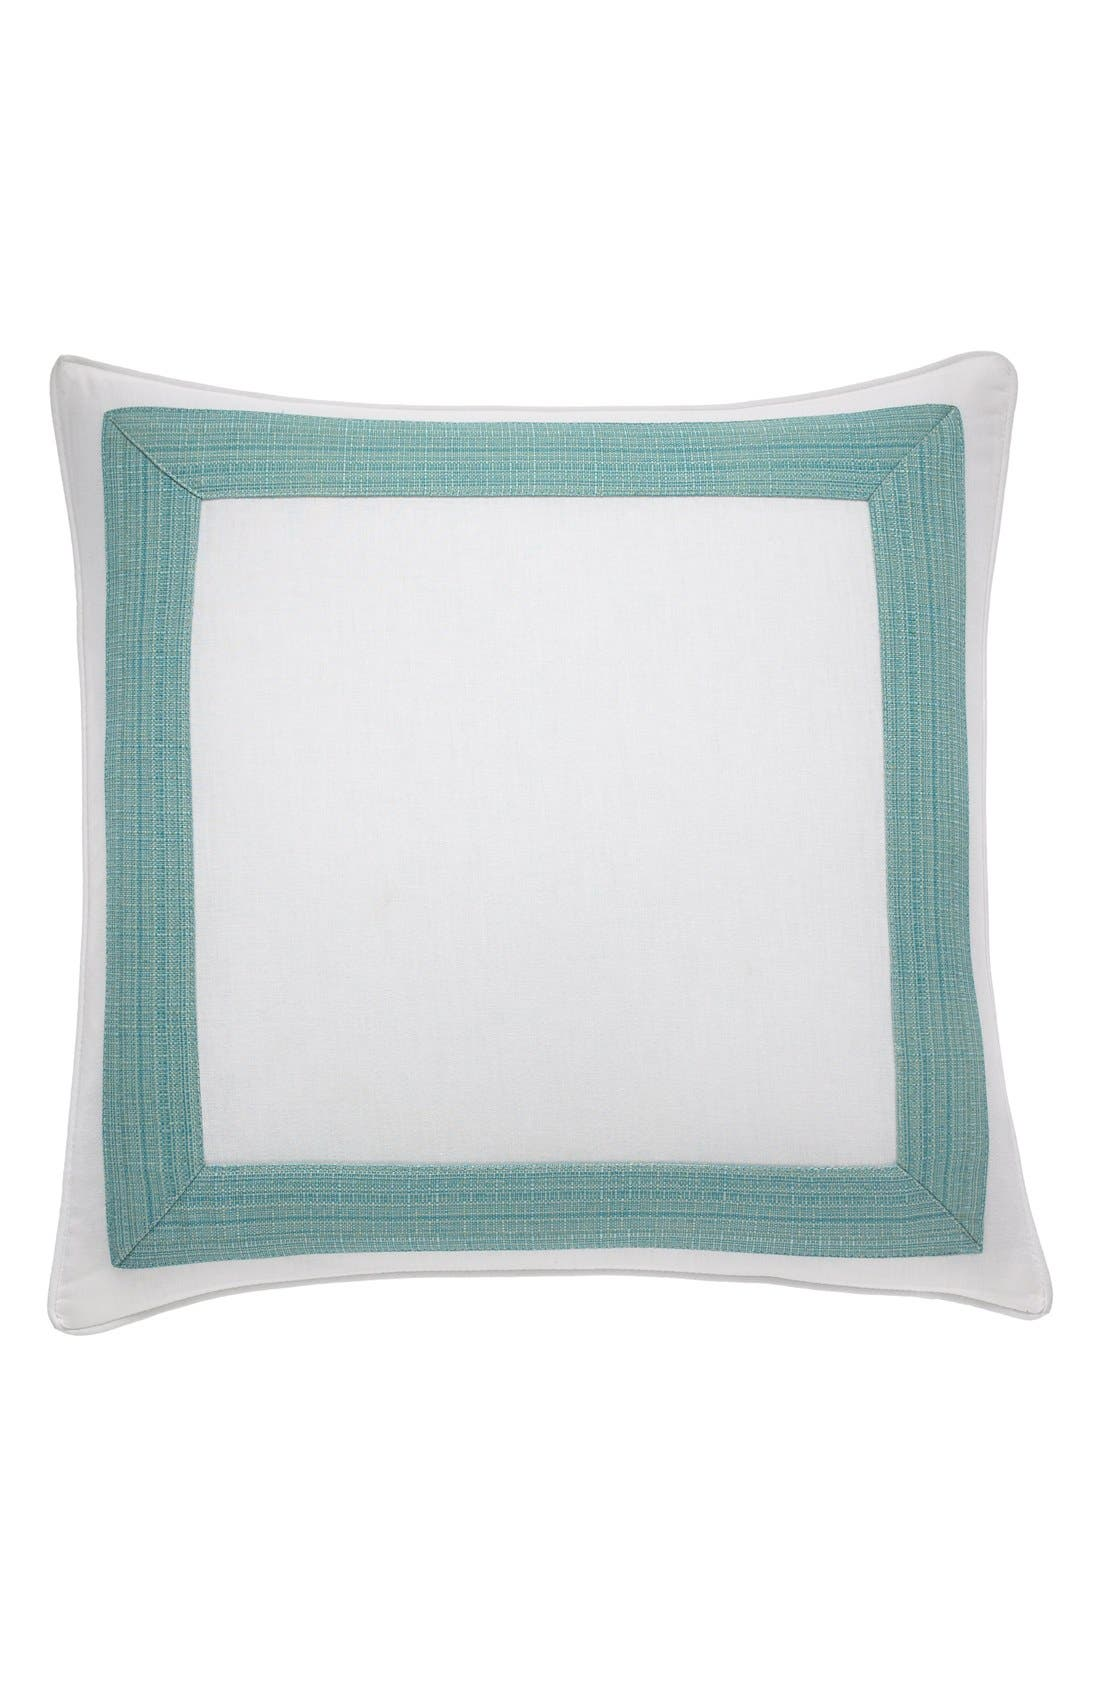 Main Image - Tommy Bahama 'Seaglass Border' Pillow